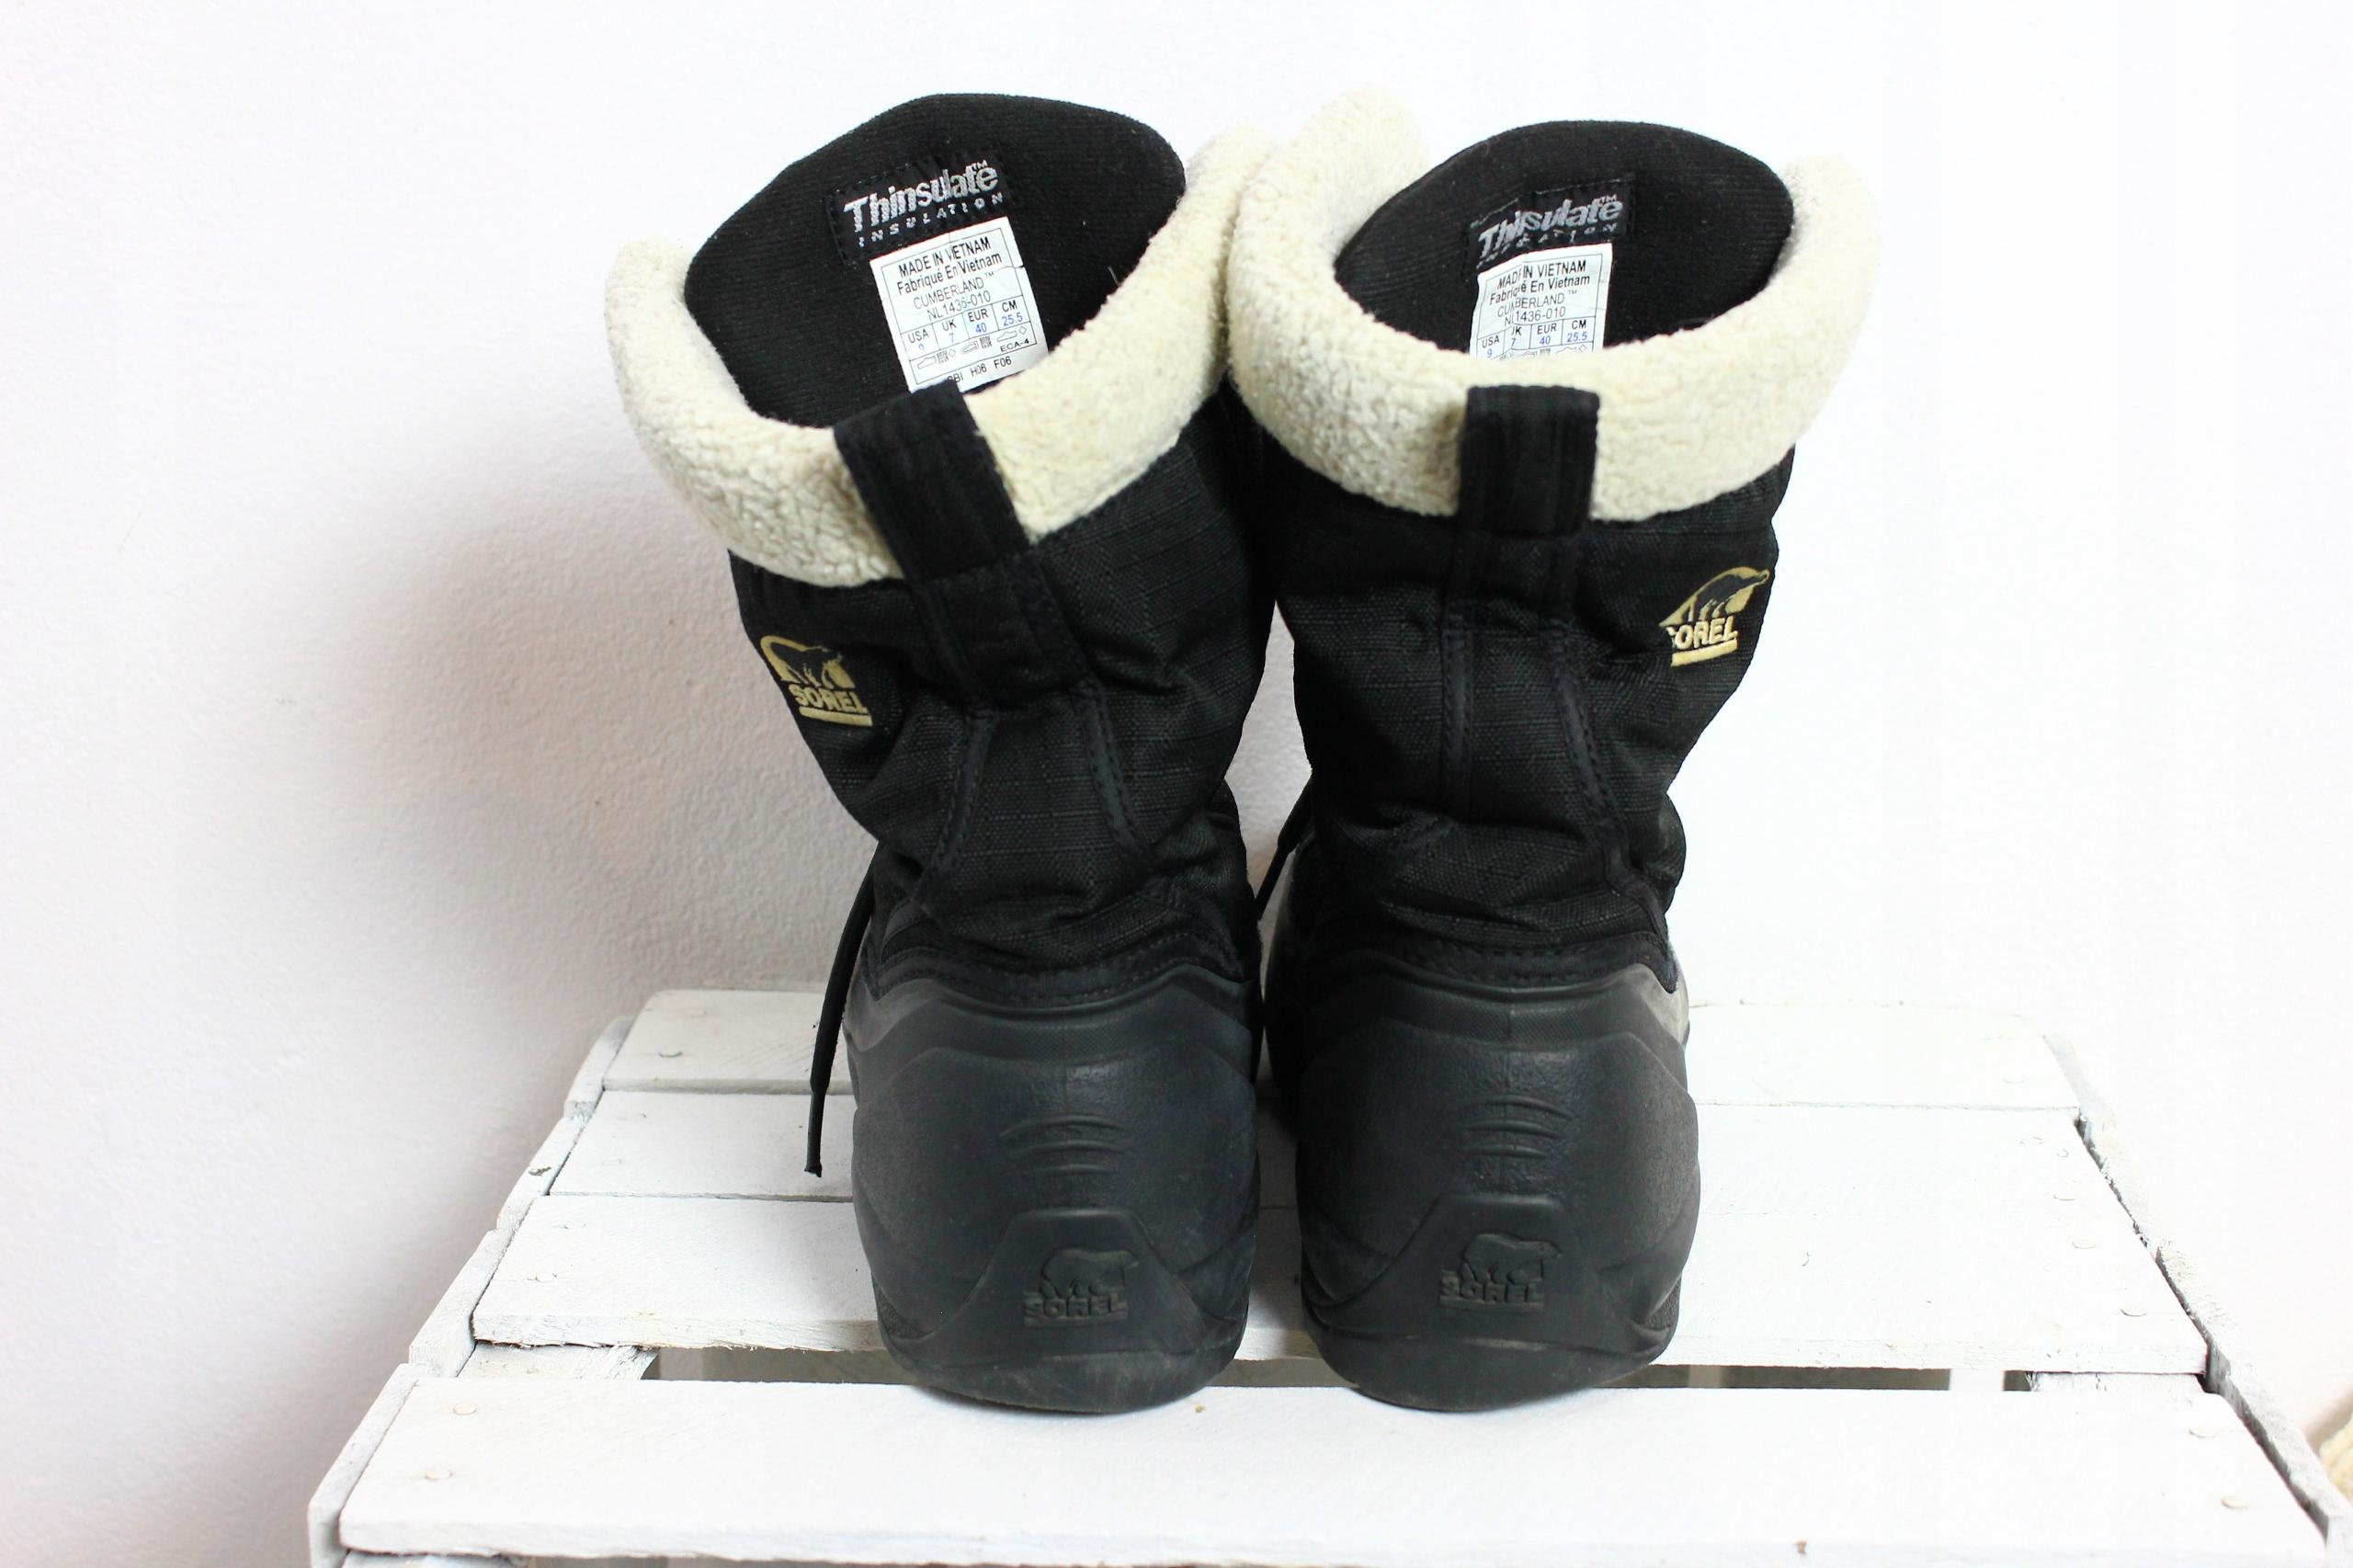 f6023516654e0 Oryginalne śniegowce ocieplane Sorel 40 - 7720665118 - oficjalne ...